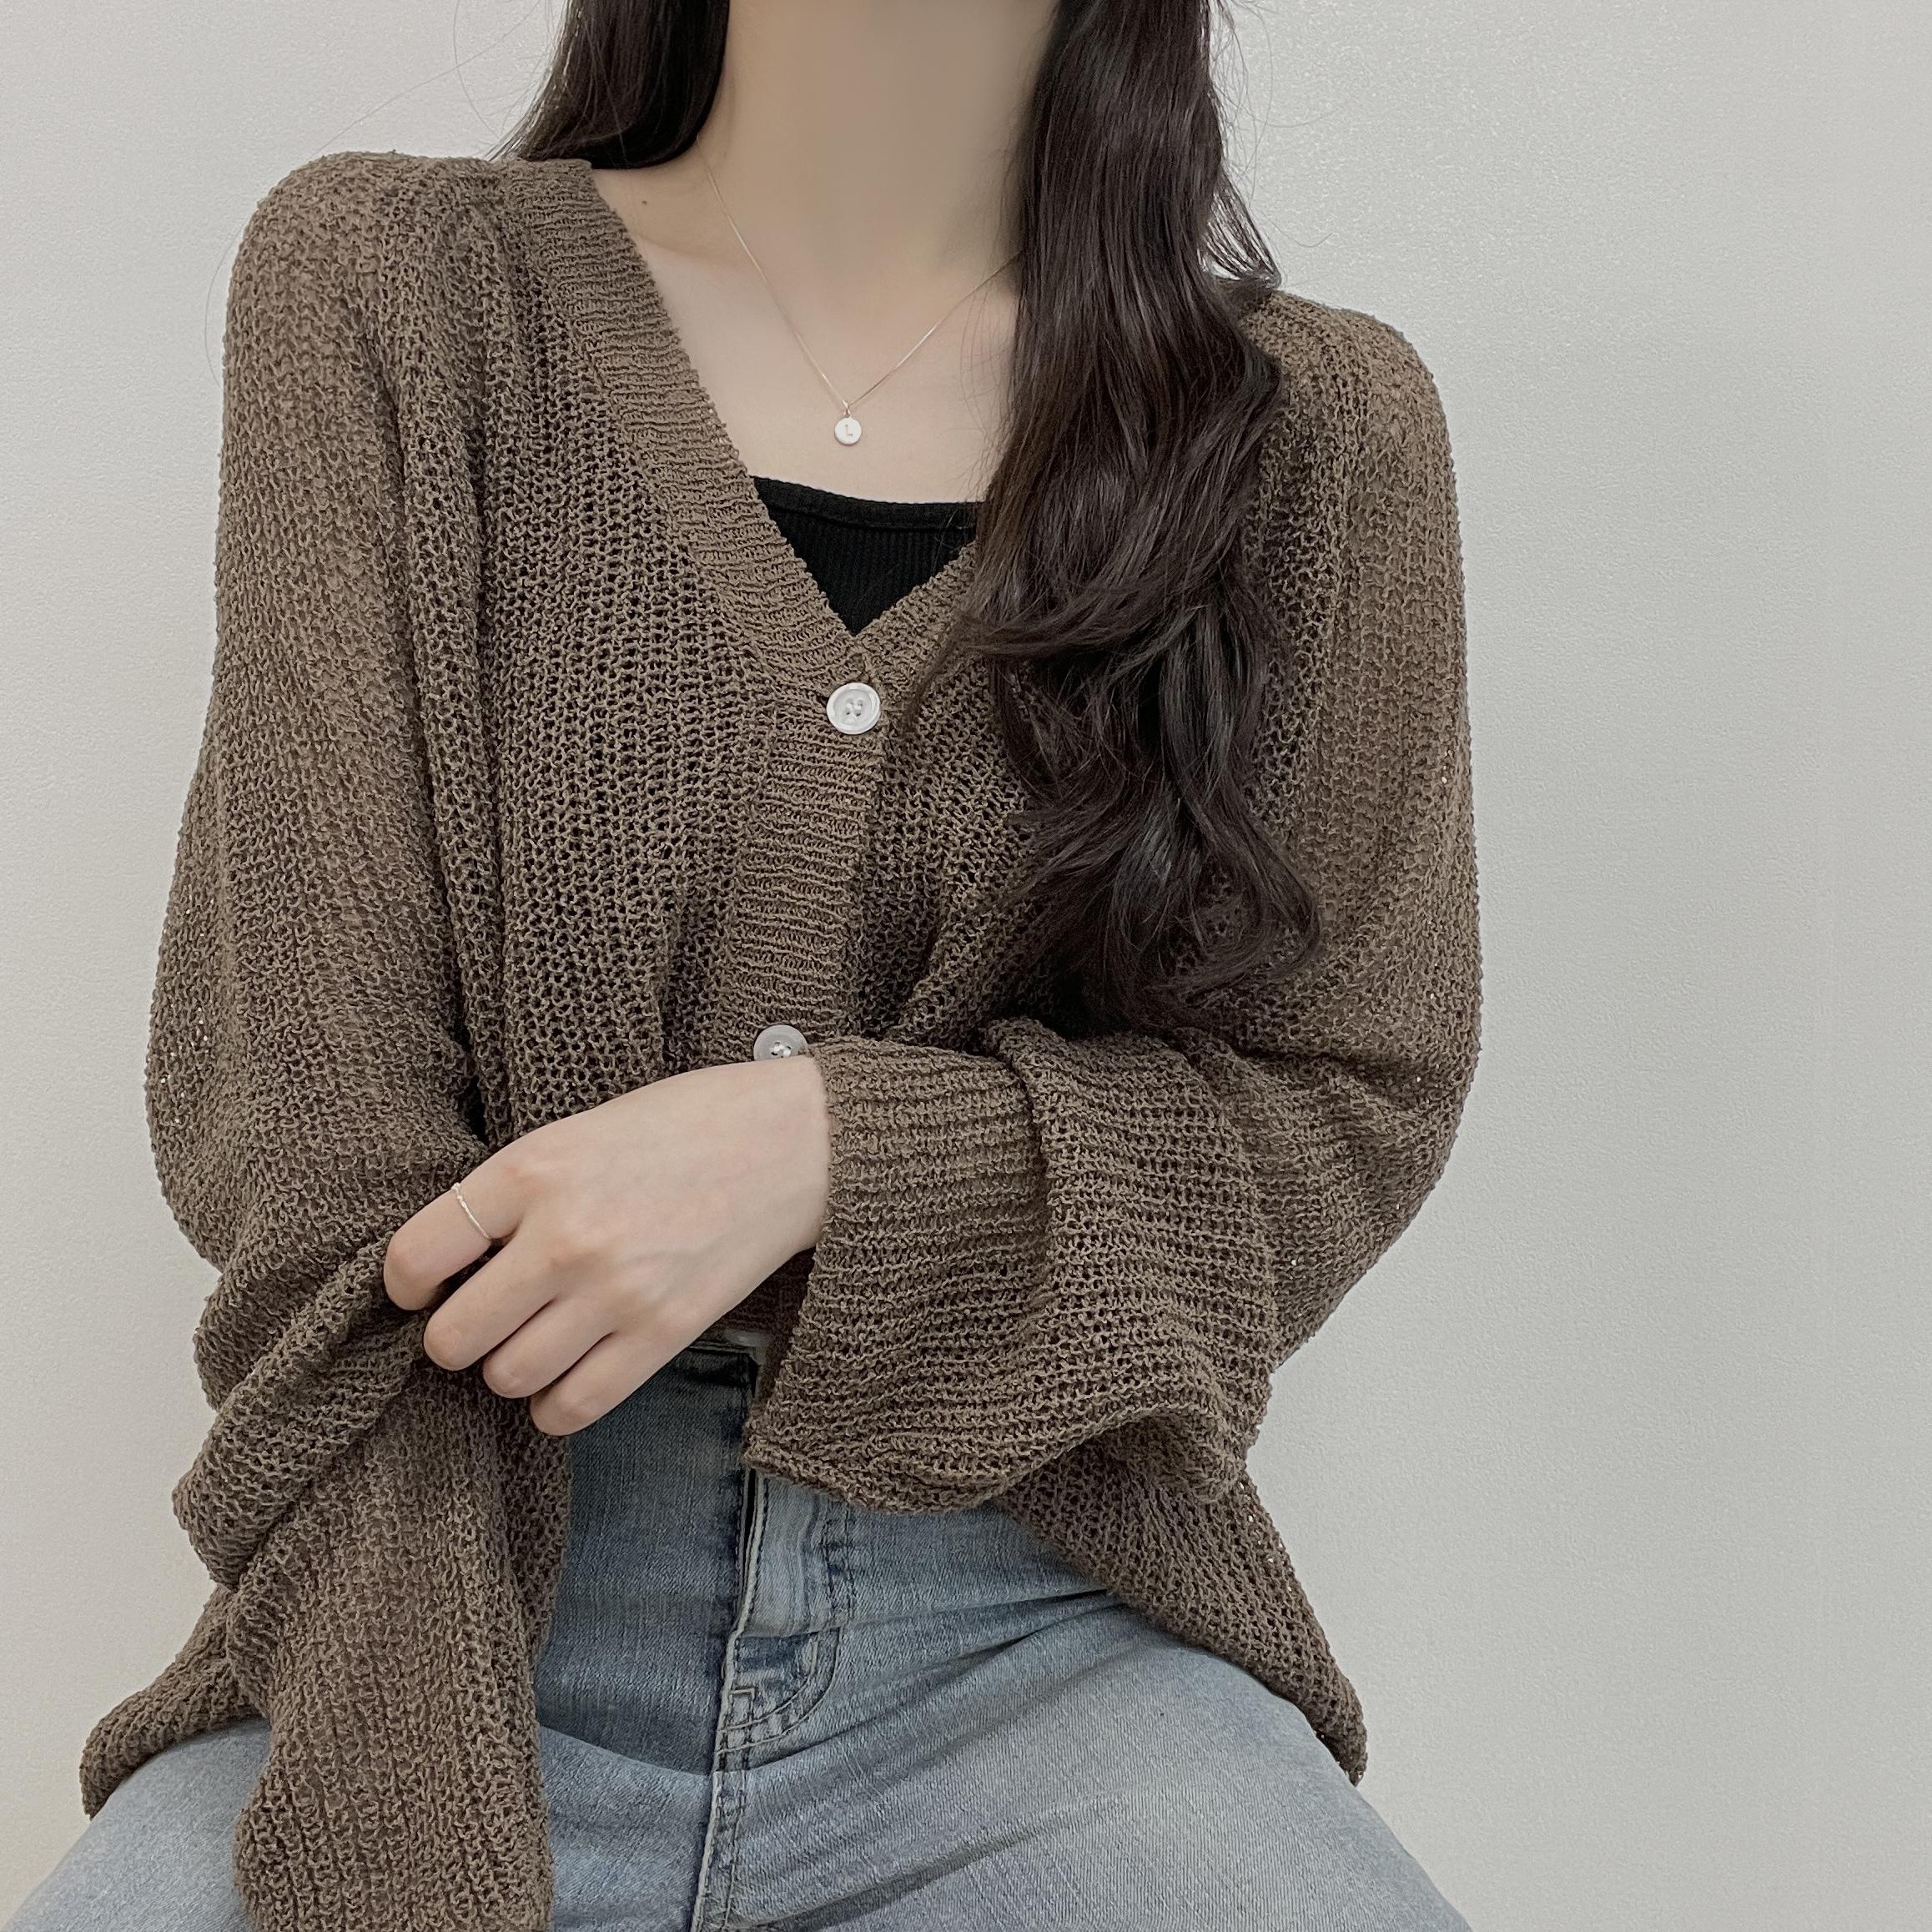 Cropple, Summer Hachi Yeori Fit V-Neck Loose Knitwear Cardigan